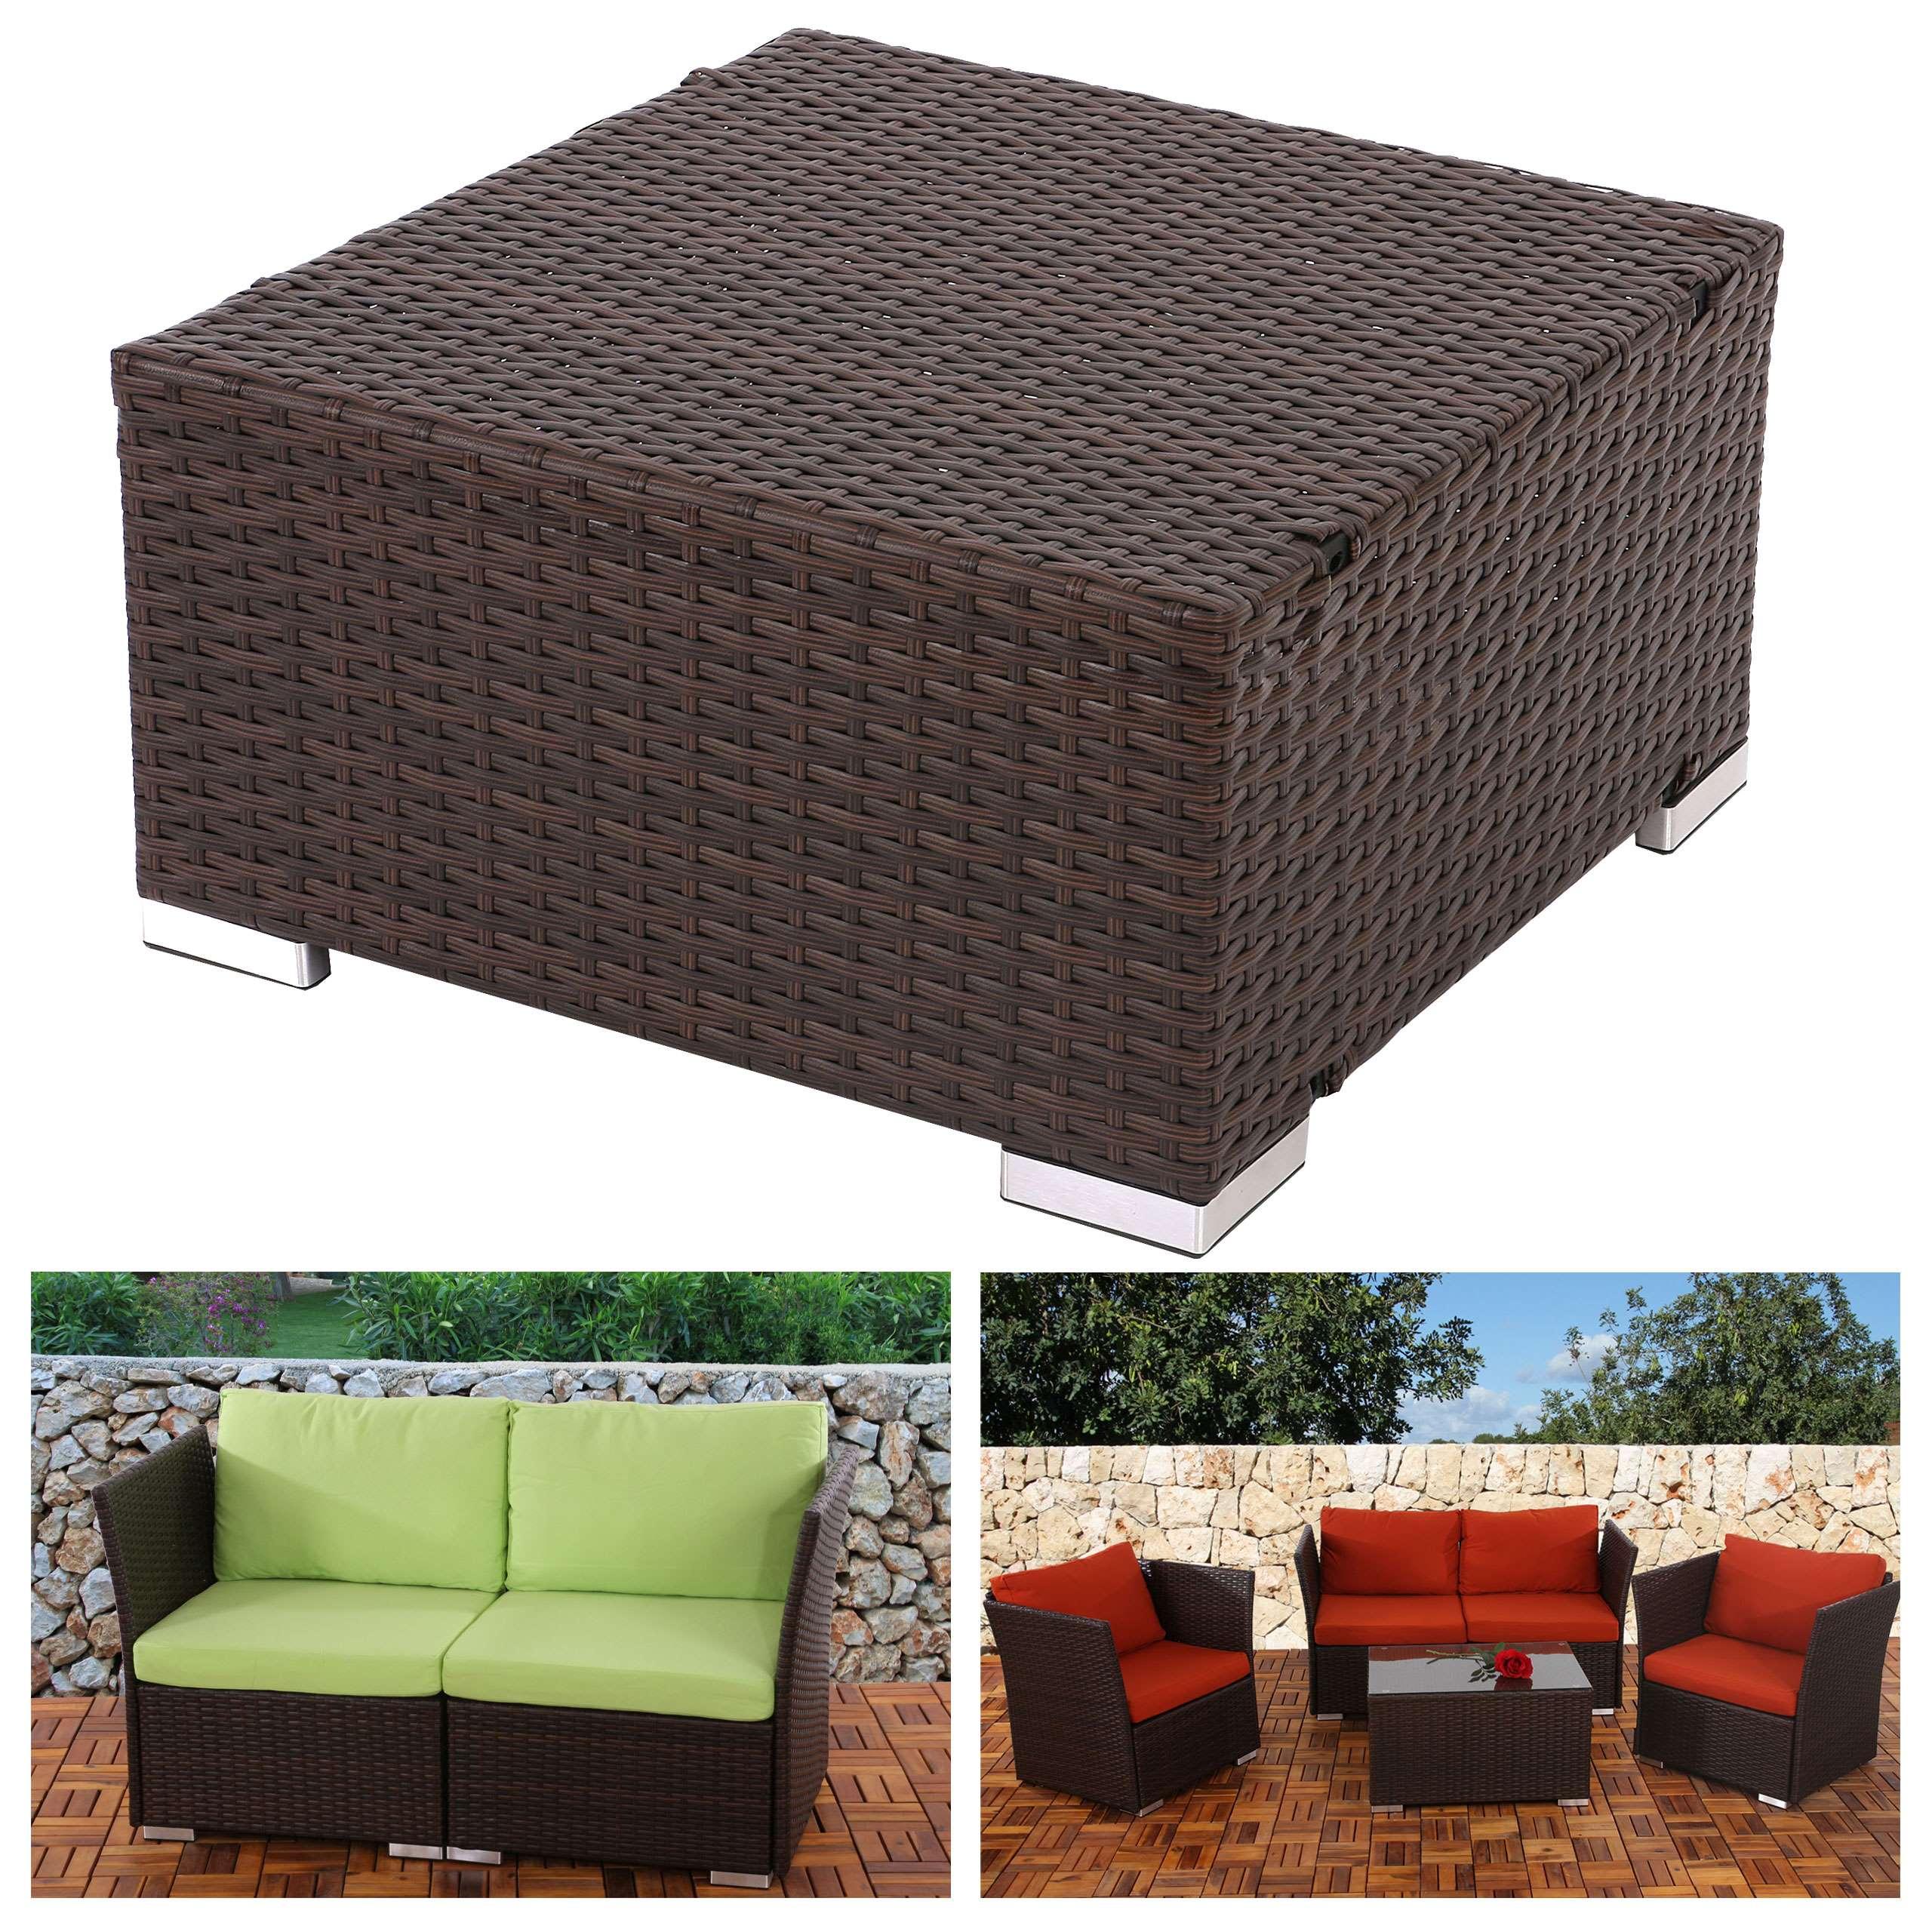 1x basismodul poly rattan sofa sevilla modulare. Black Bedroom Furniture Sets. Home Design Ideas